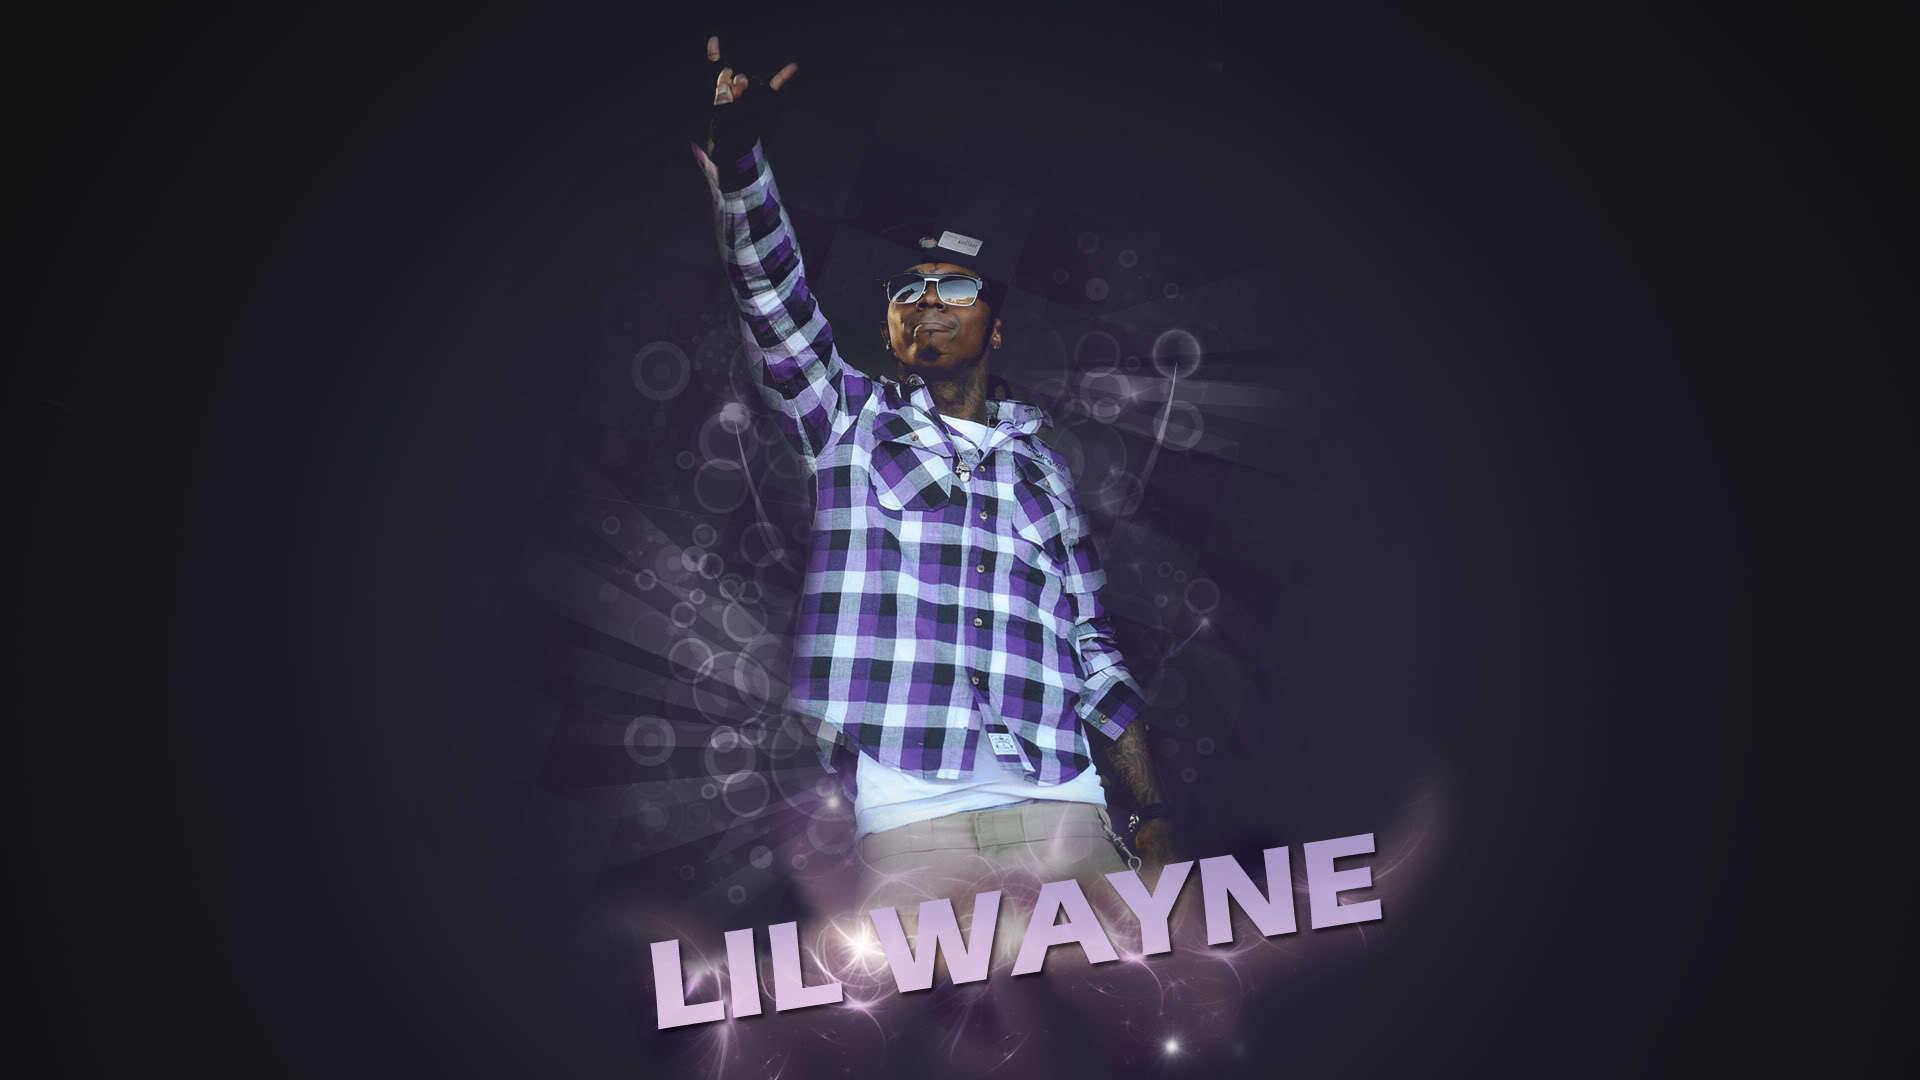 Lil Wayne Desktop Wallpaper